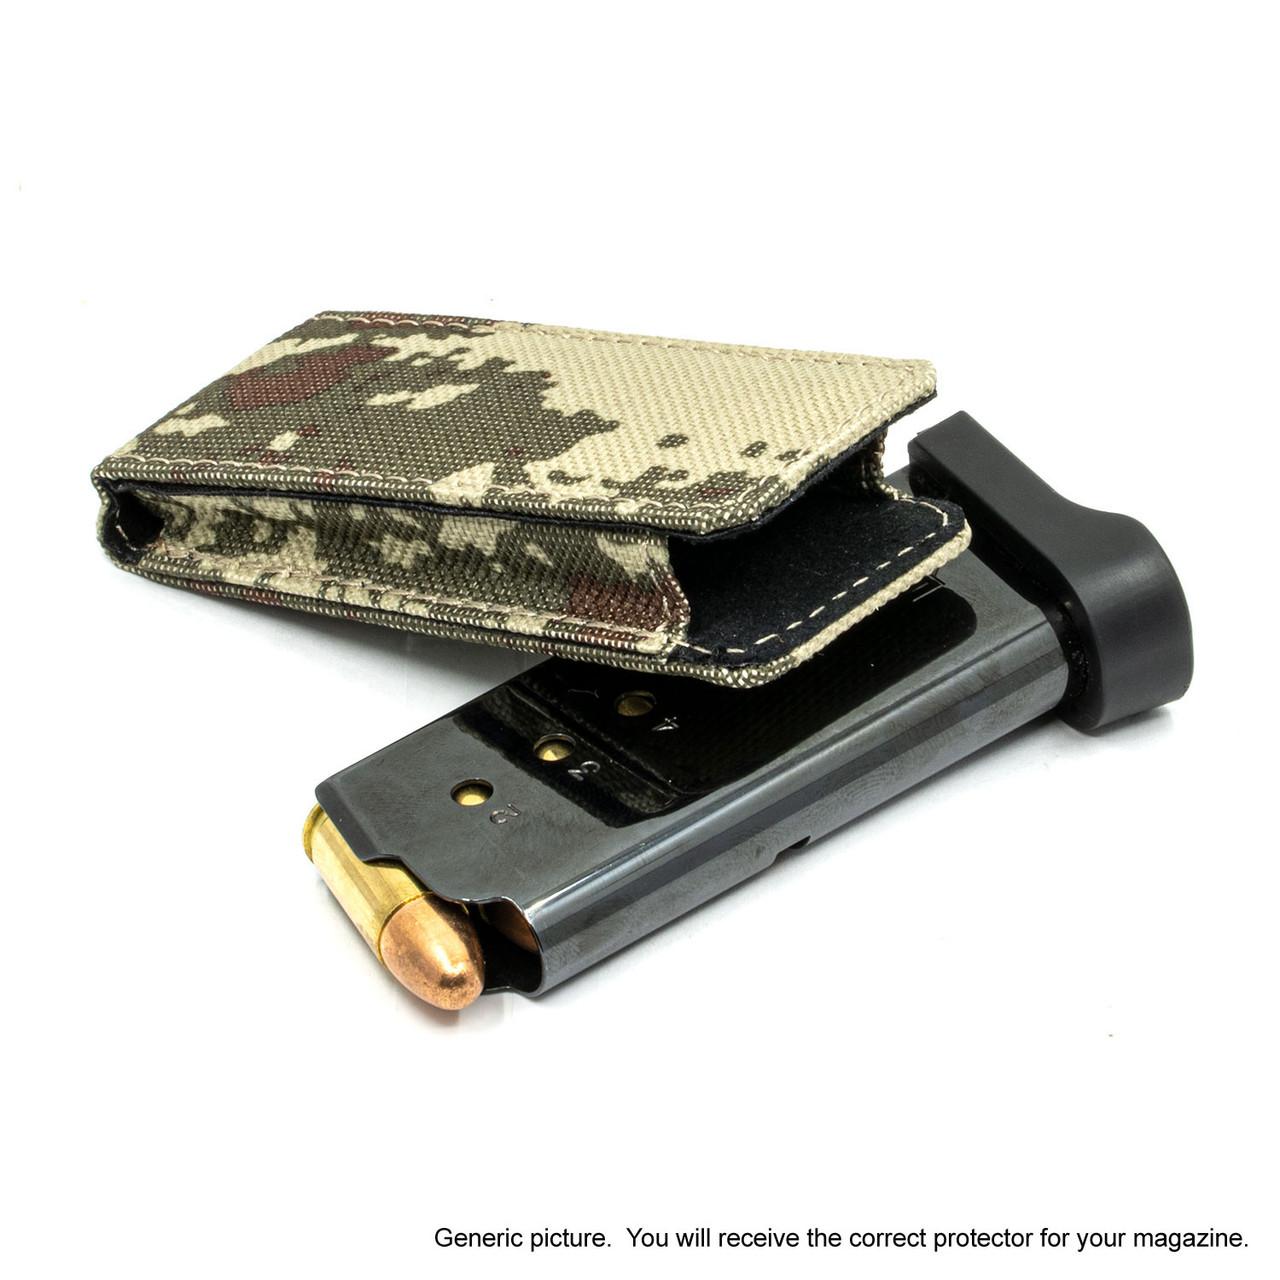 Beretta Nano Camouflage Nylon Magazine Pocket Protector